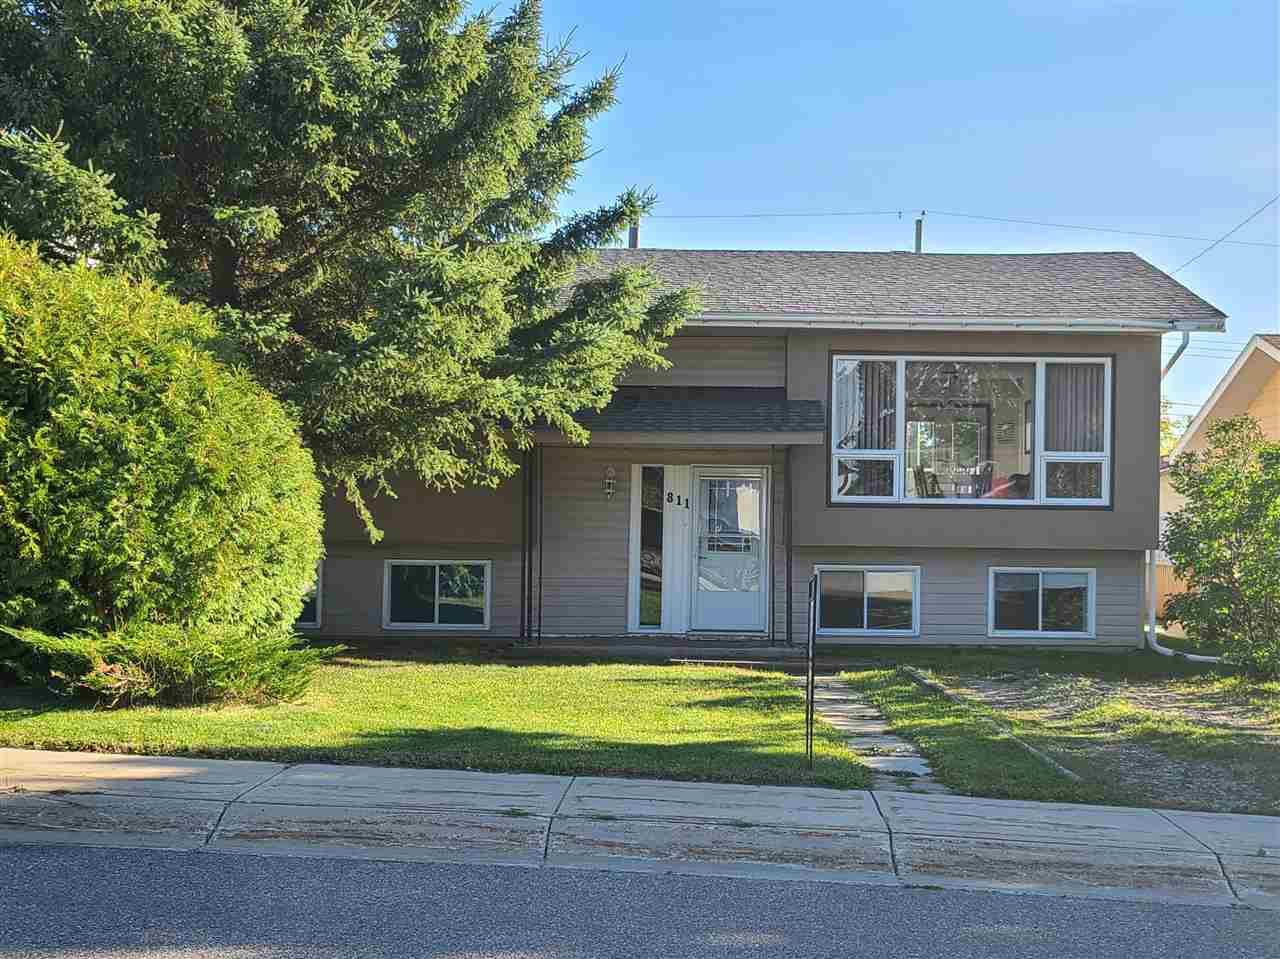 Main Photo: 811 11 Avenue: Cold Lake House for sale : MLS®# E4213248